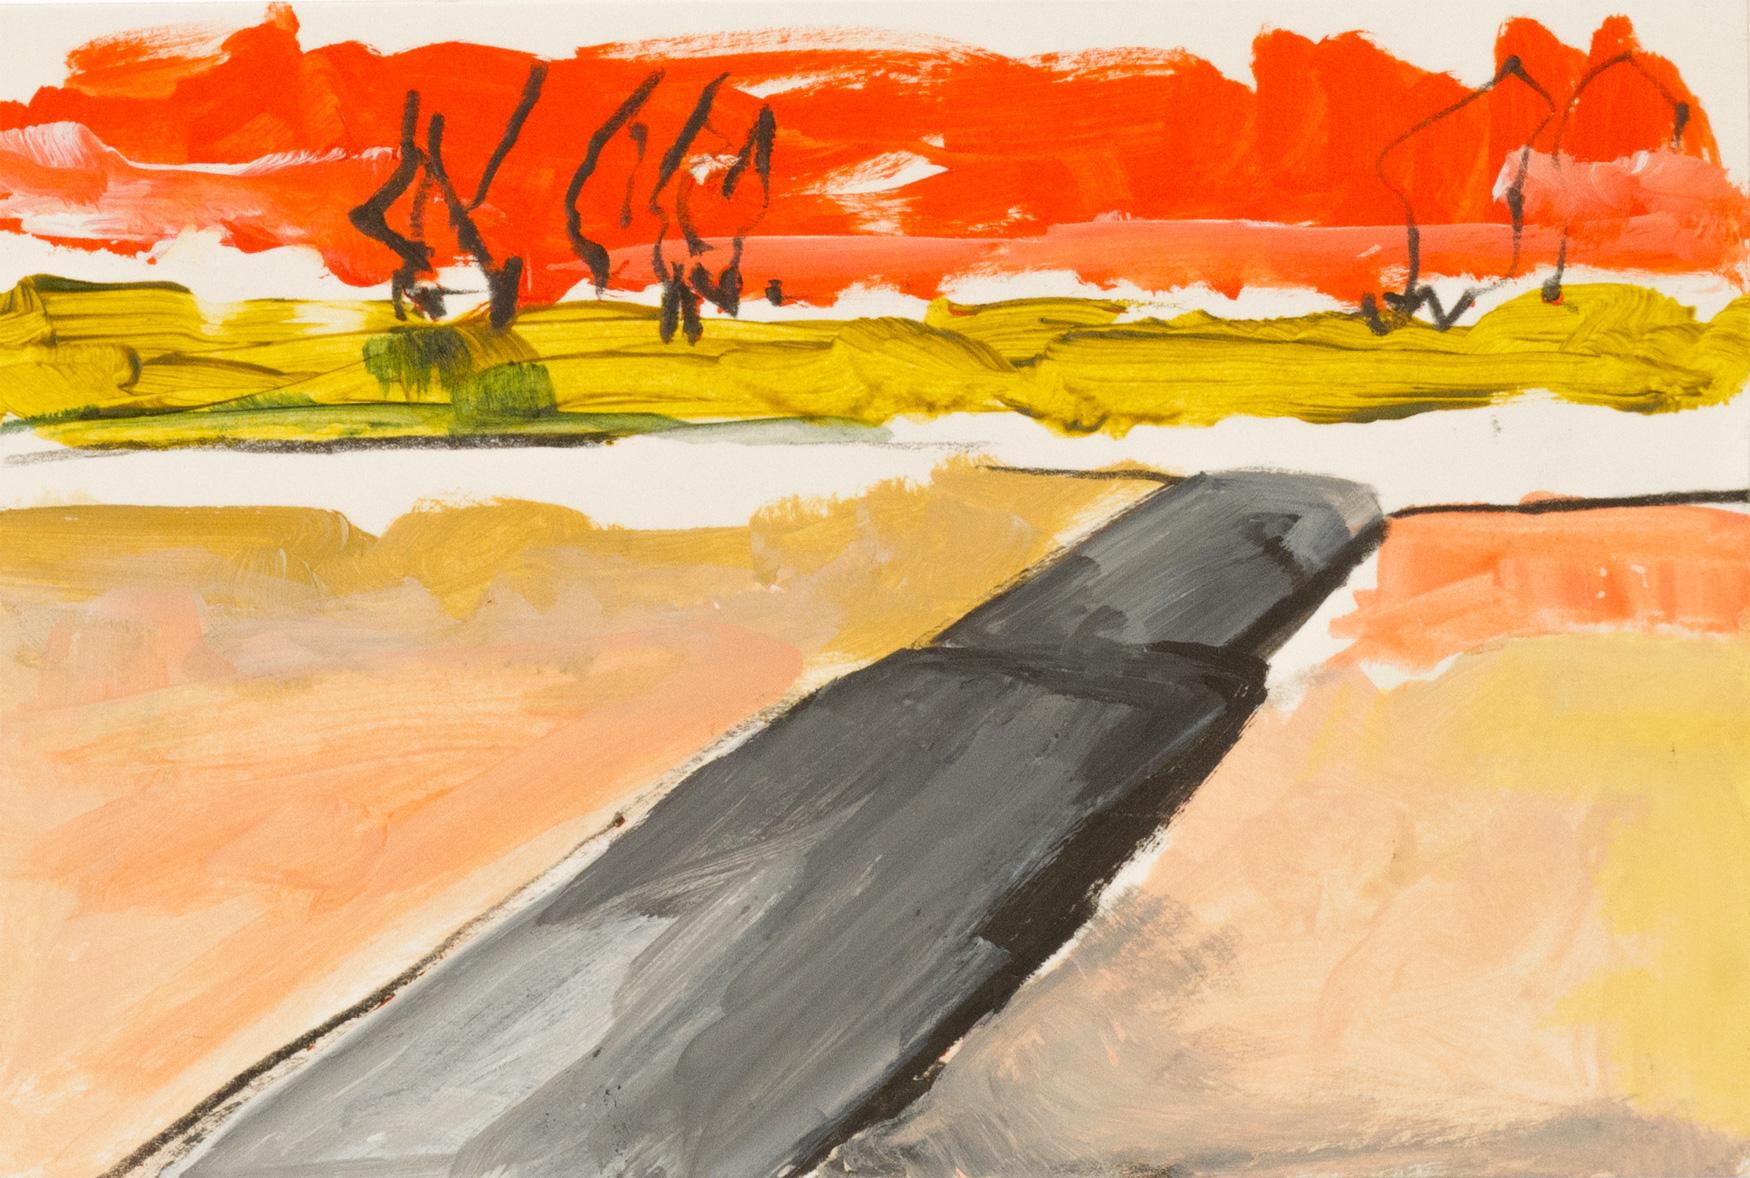 Landschaft, Panorama, 2008 Acryl und Pitt Oil Base auf Papier 10 x 133 cm Landschaft, Panorama, 2014 Acryl und Pitt Oil Base auf Papier 10 x 133 cm, Detail